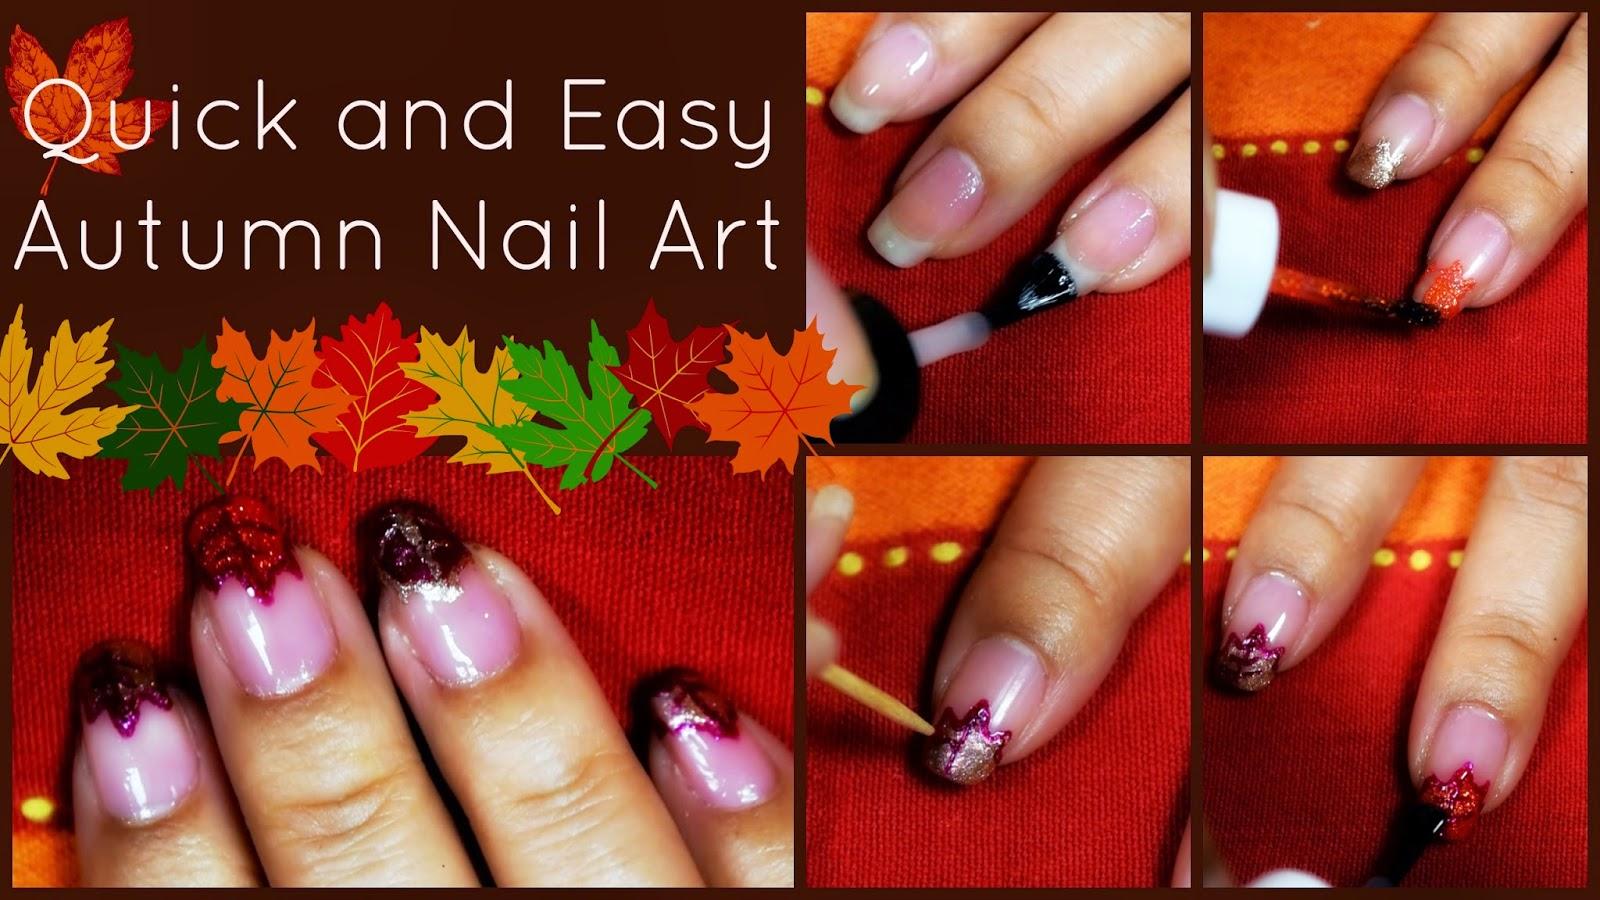 MakeupMaiWorld: Quick and Easy Autumn Nail Tutorial - Autumn Leaves